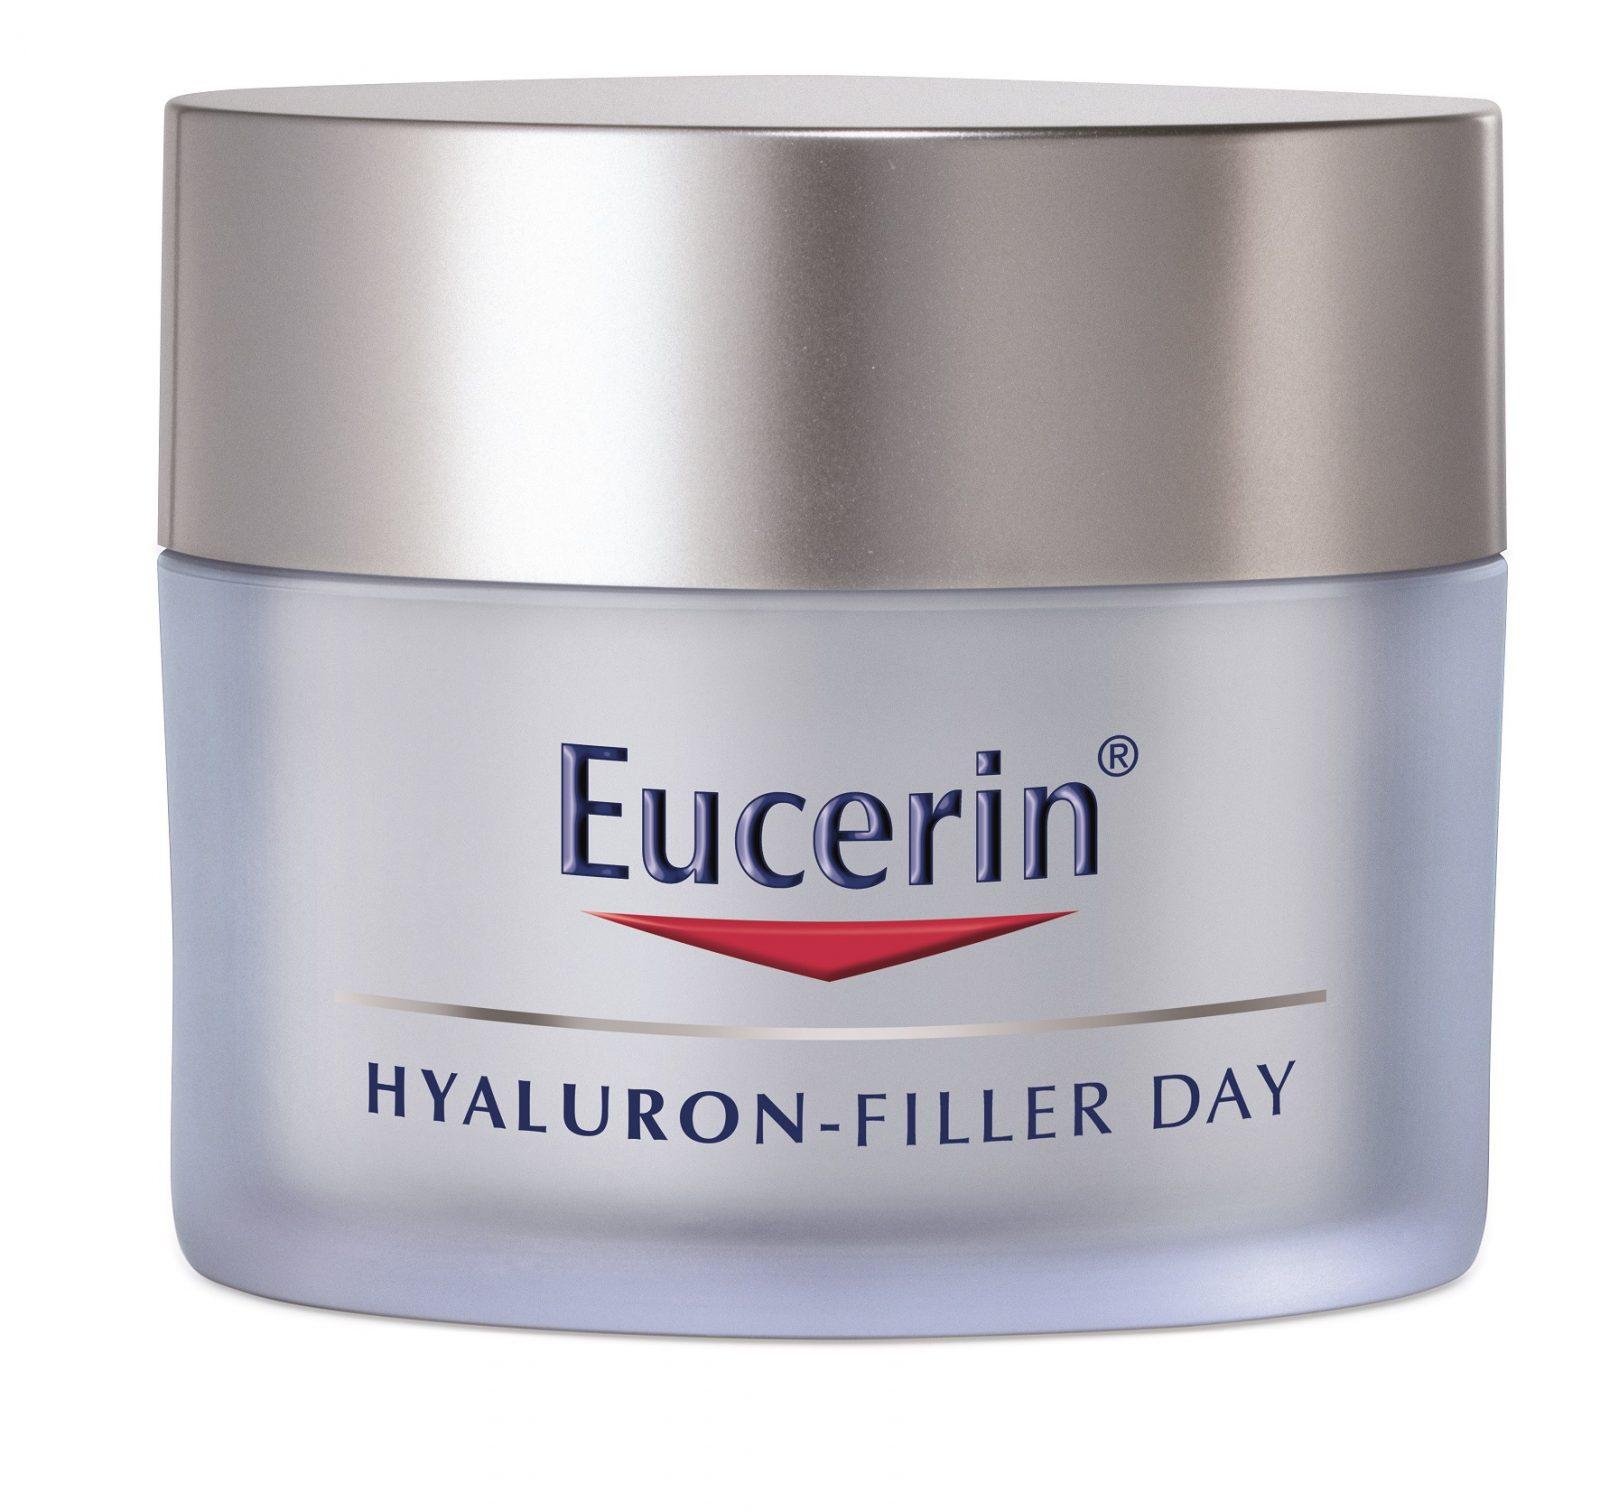 Eucerin® Hyaluron Filler linija - dokazani borac protiv površinskih i dubinskih znakova starenja!